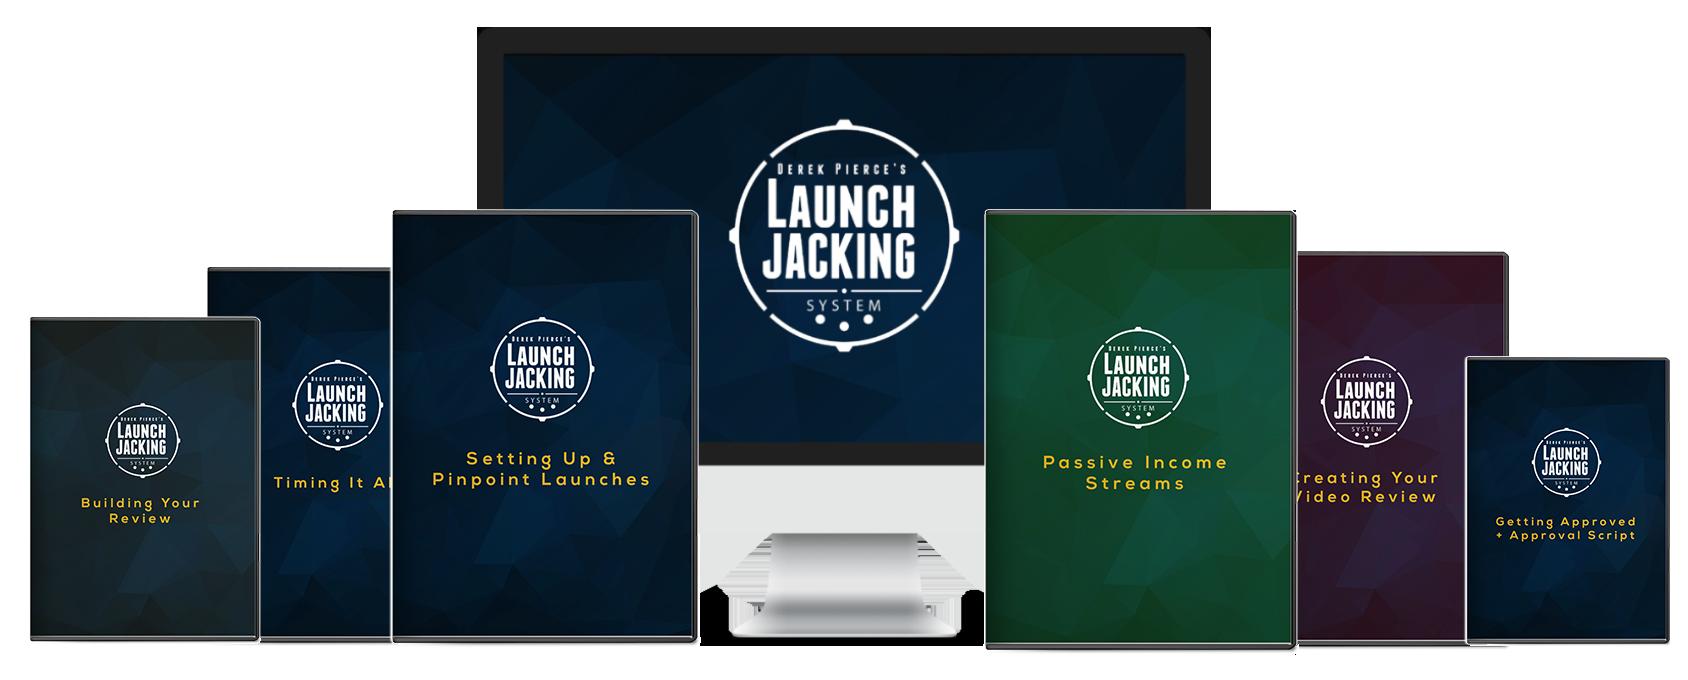 Launch Jacking System by Derek Pierce